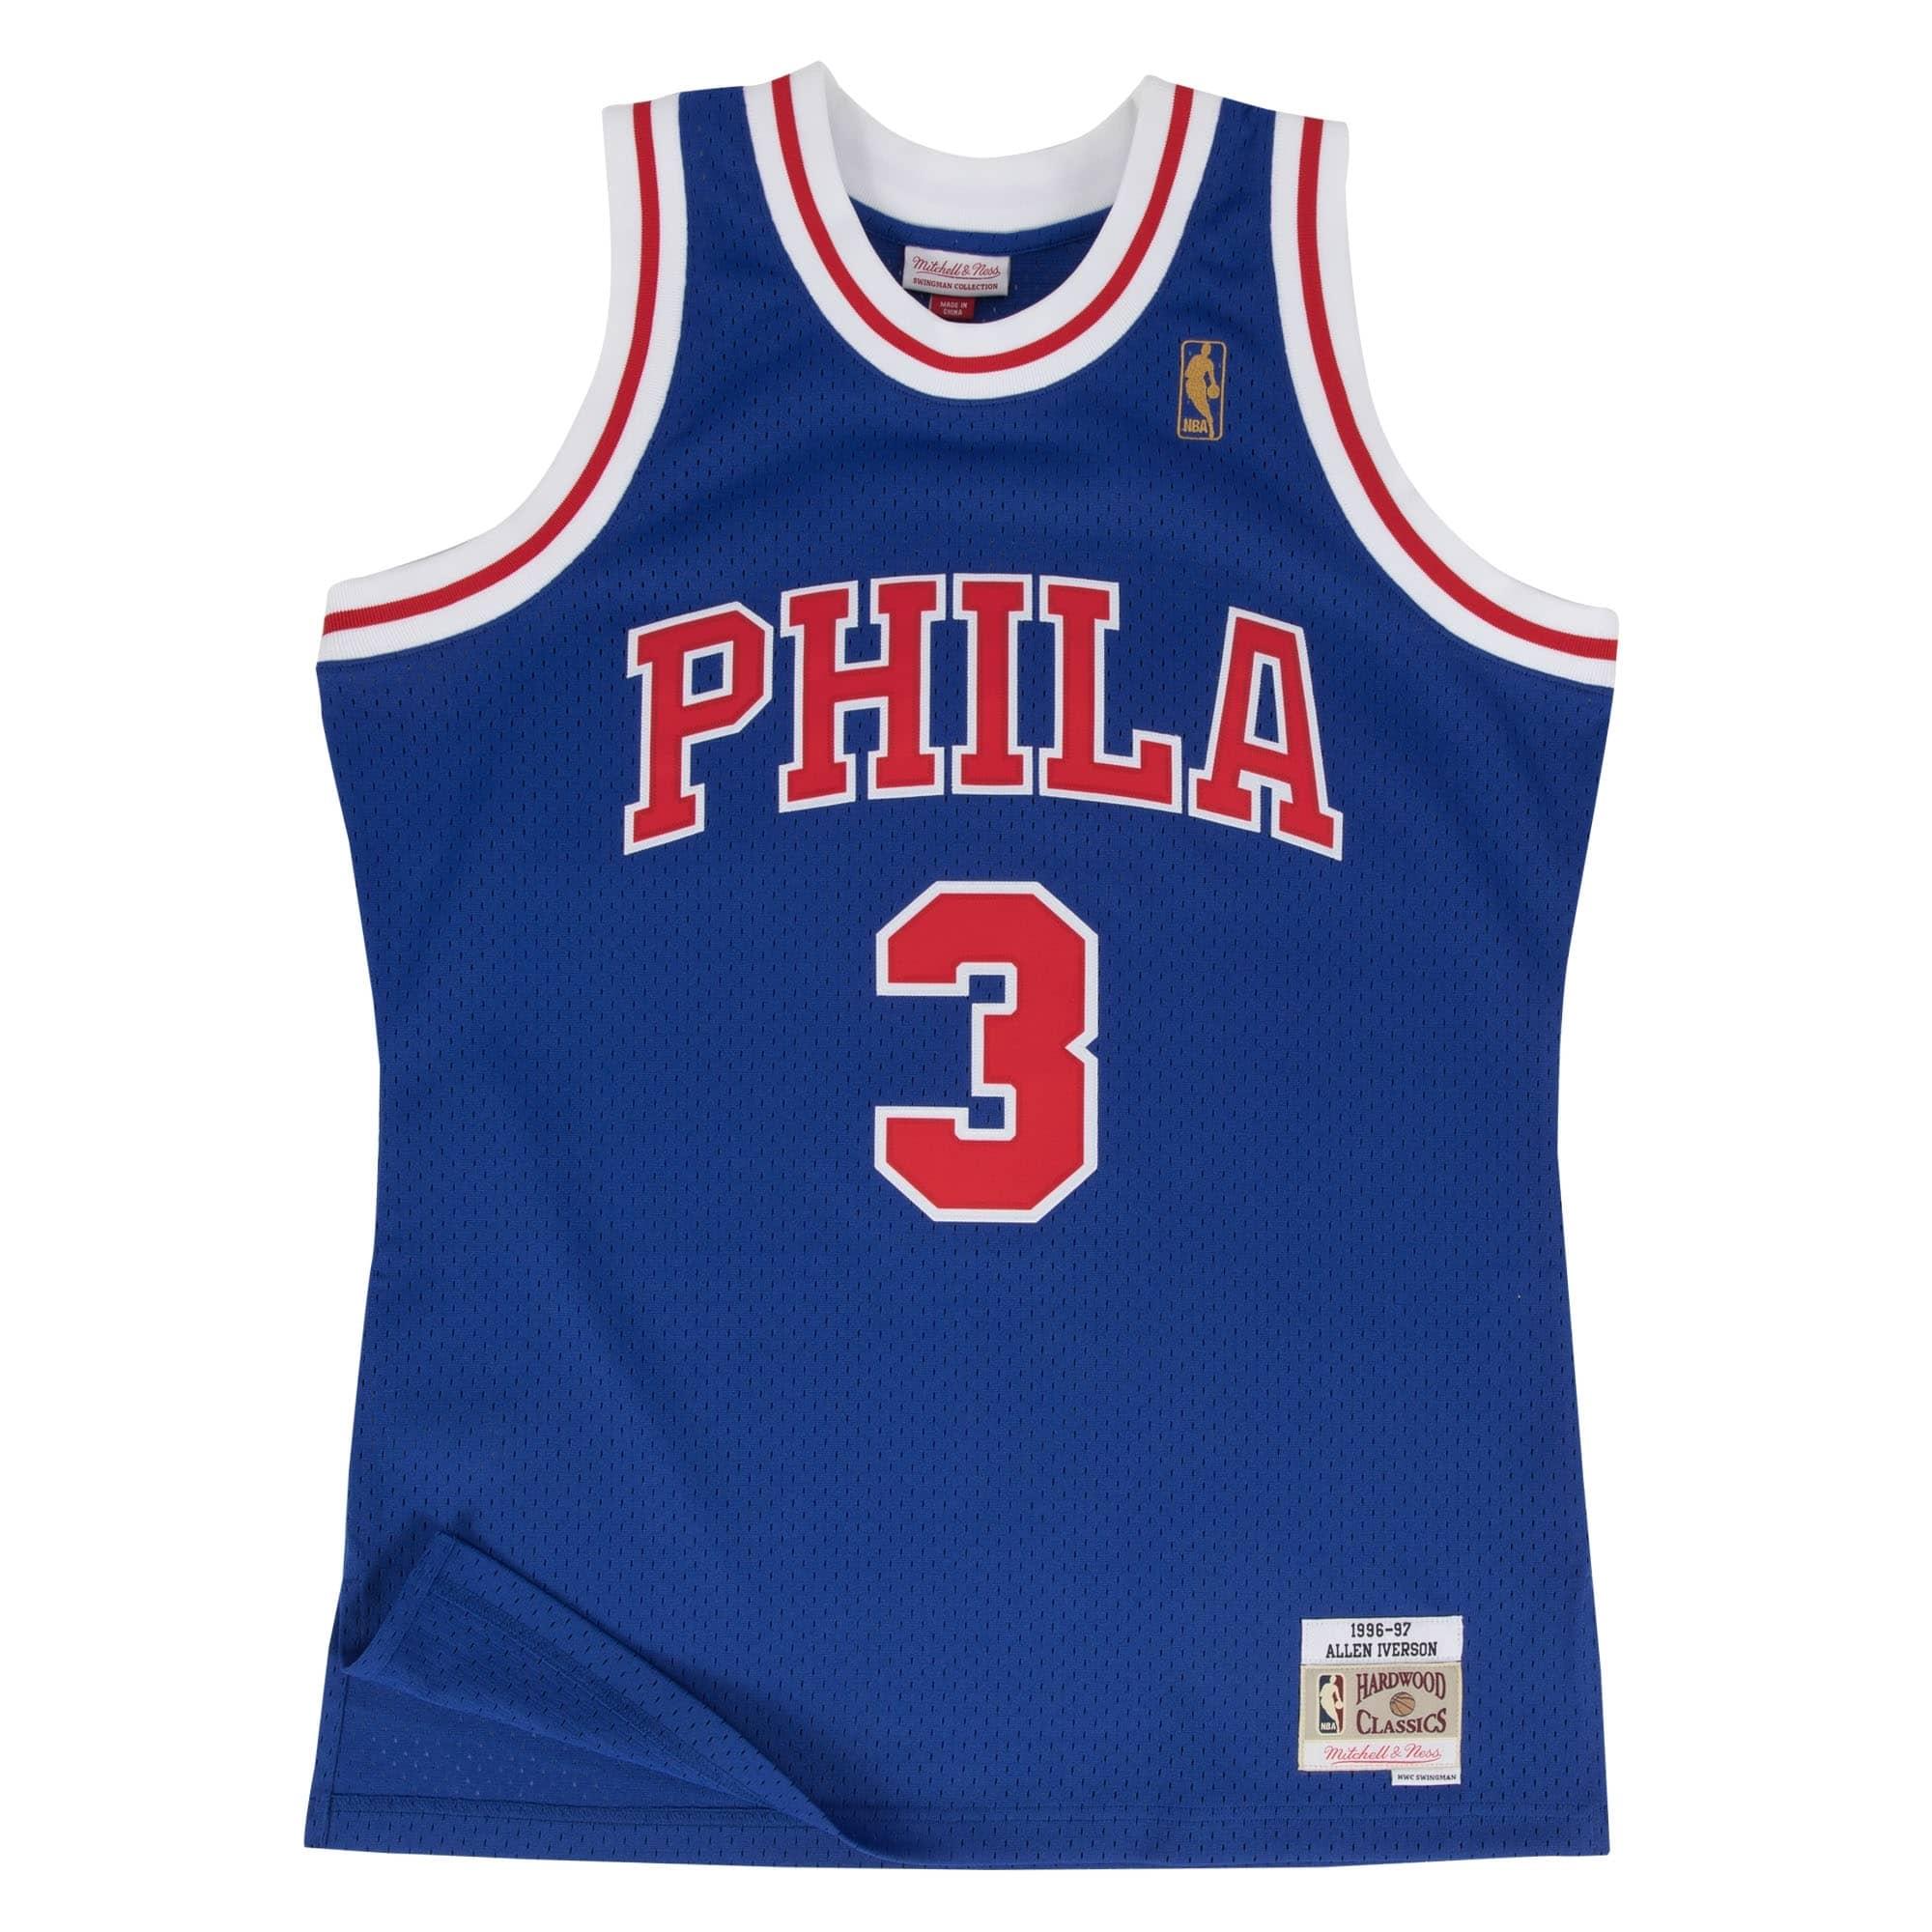 XXL S Philadelphia 76ers #3 Allen Iverson White Basketball Jersey Size